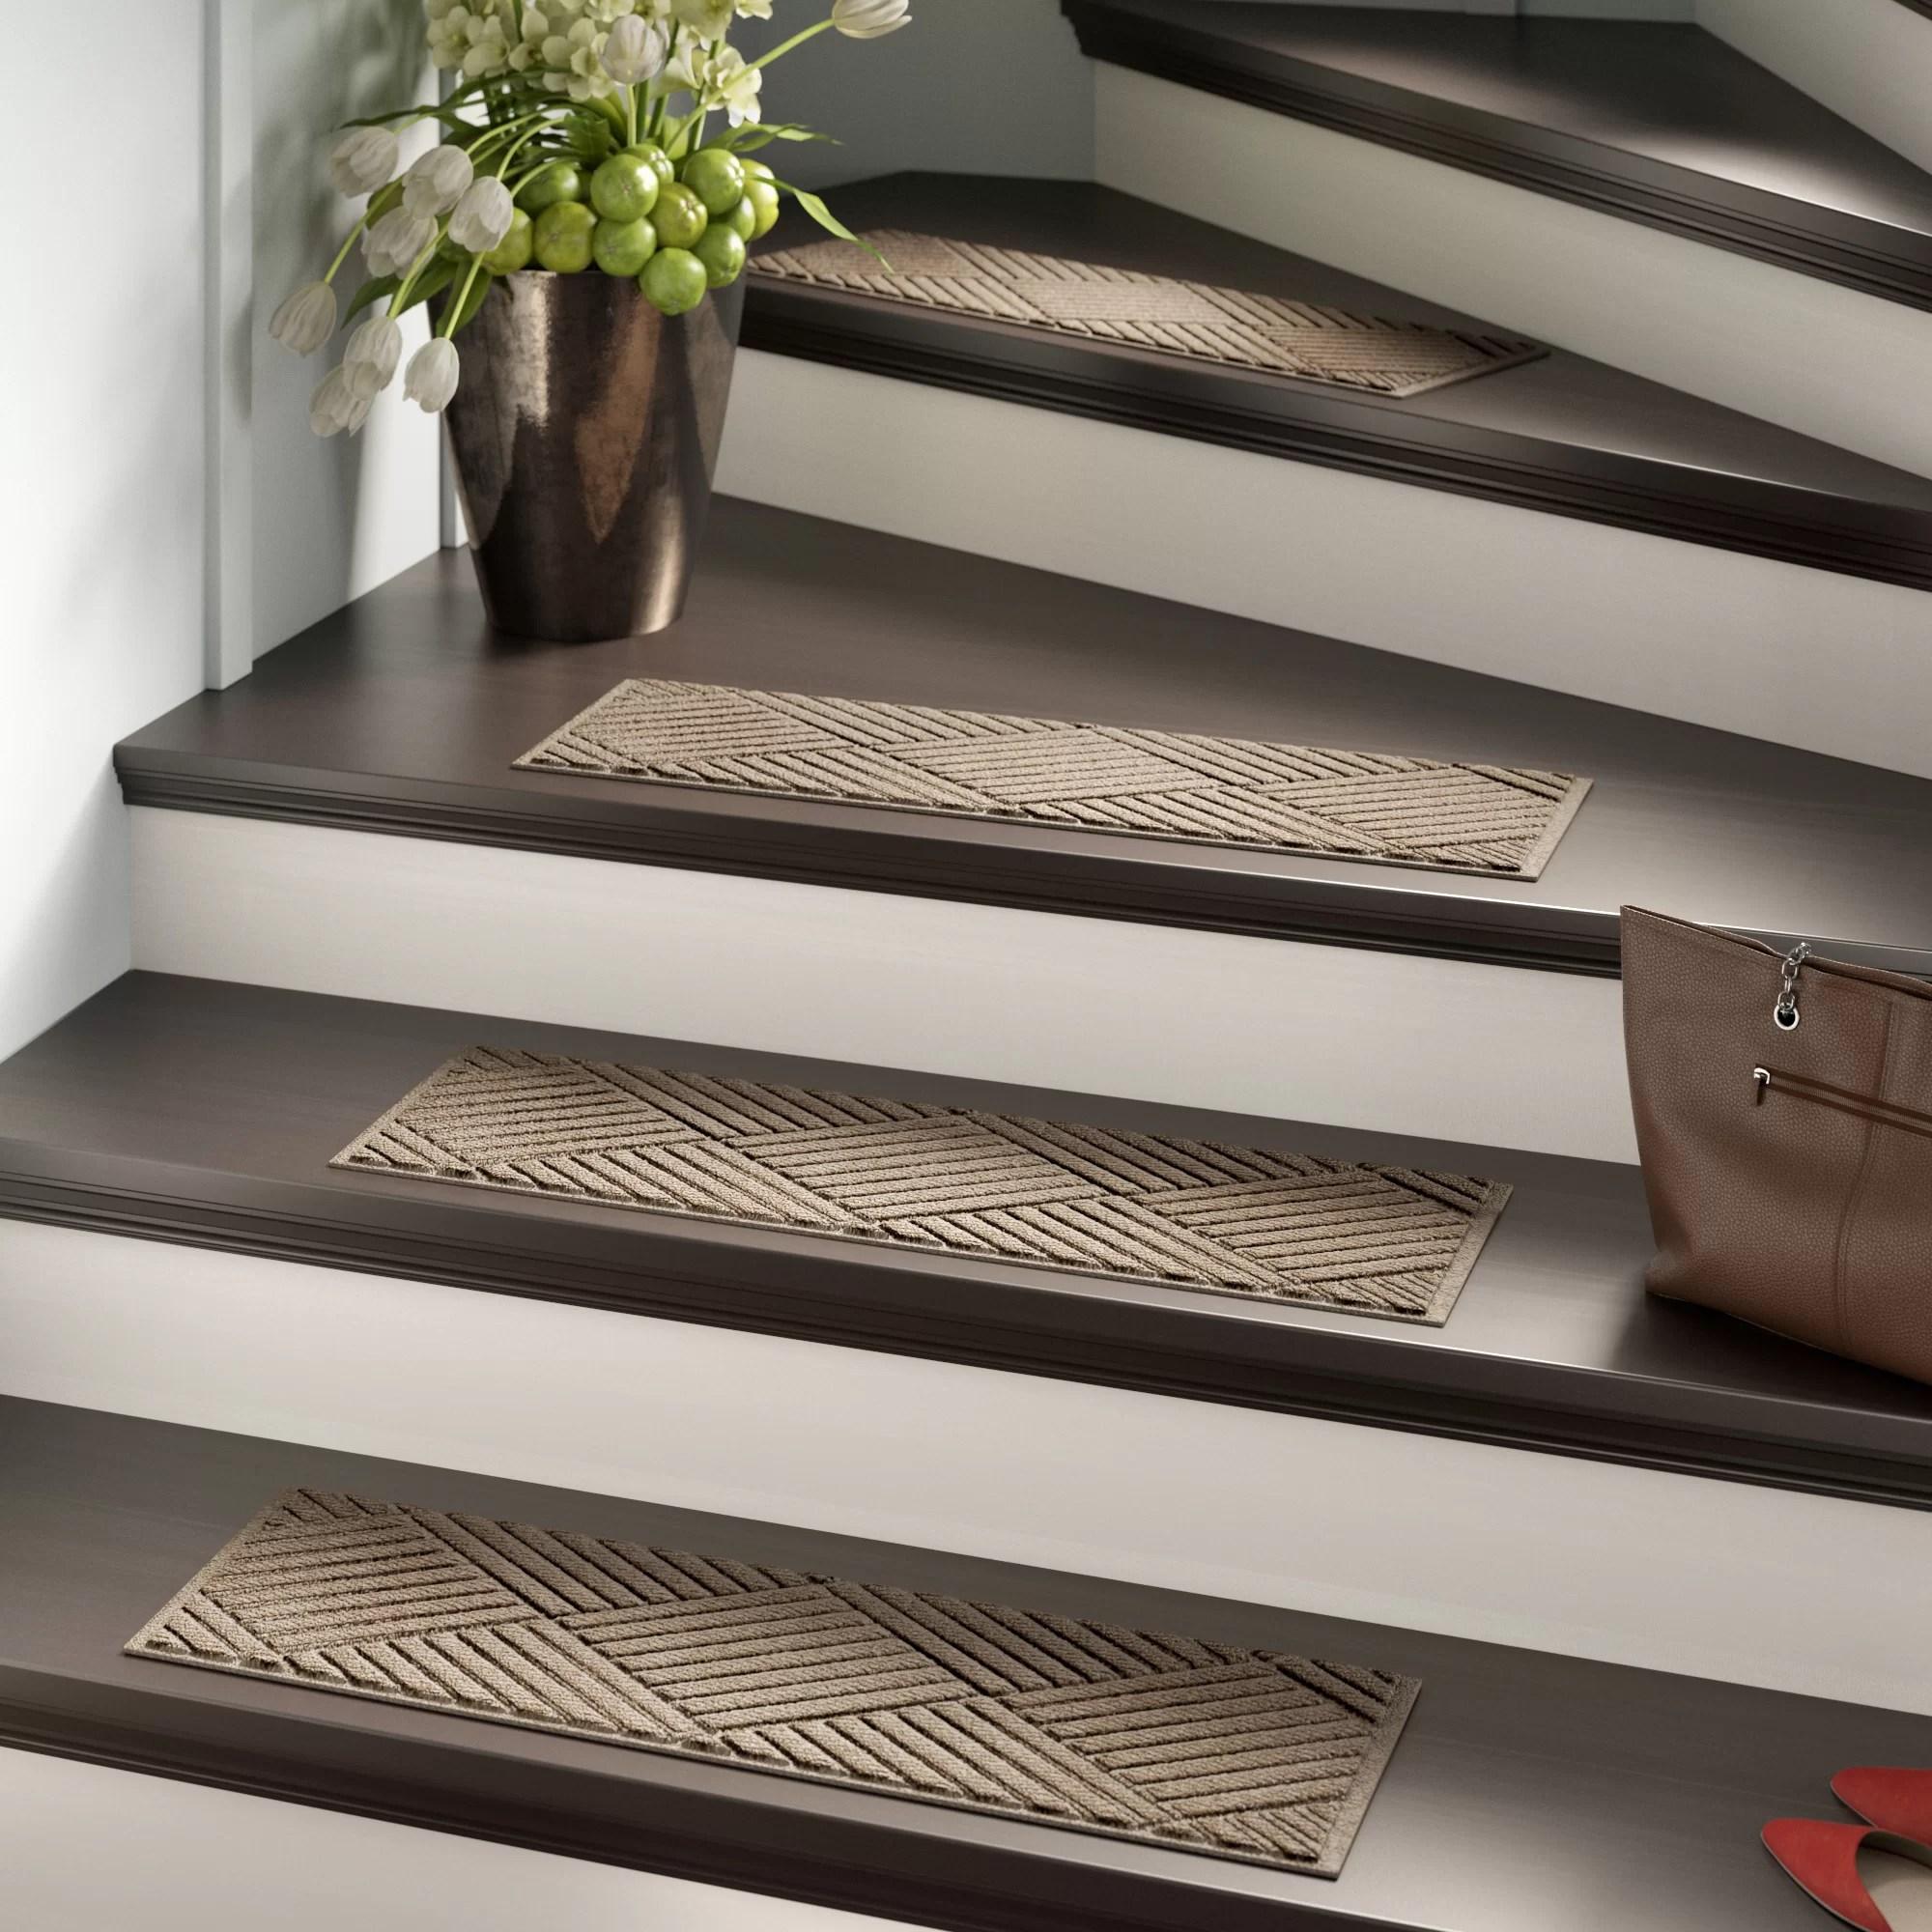 Stair Tread Rugs You Ll Love In 2020 Wayfair   Designer Carpet Stair Treads   Stair Runner   Non Slip   Oak Valley Designs   Flooring   Wood Grain